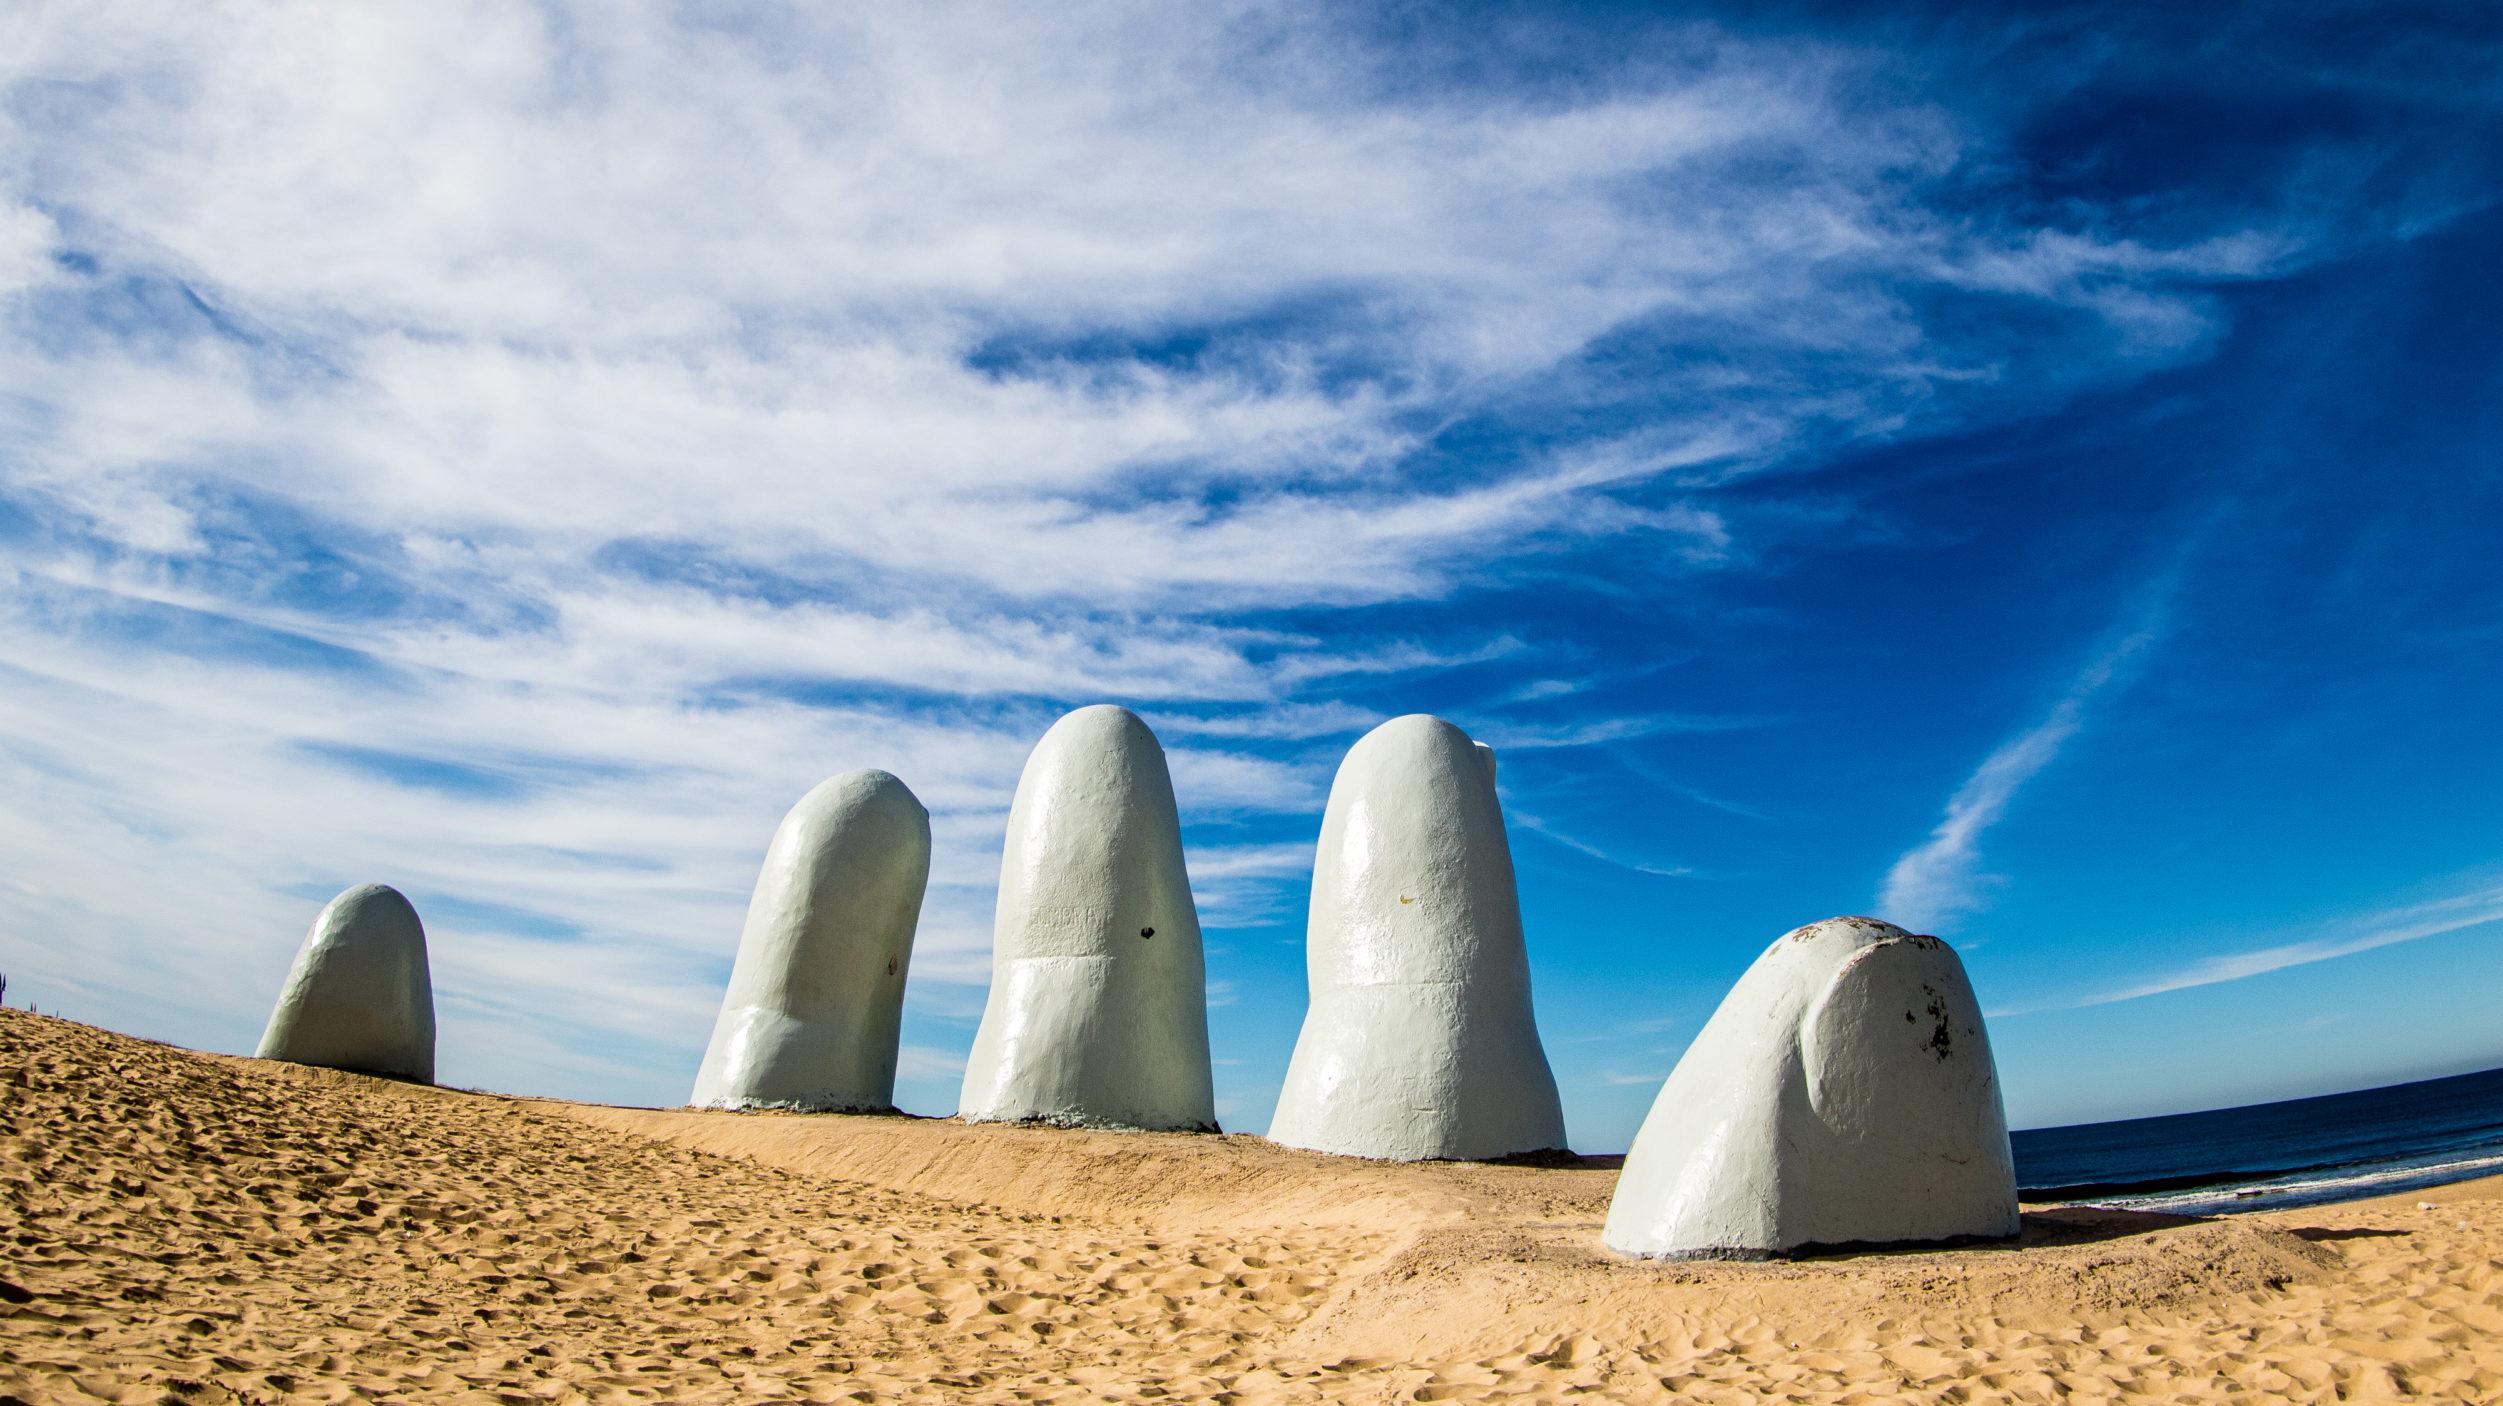 Uruguay [Shutterstock]